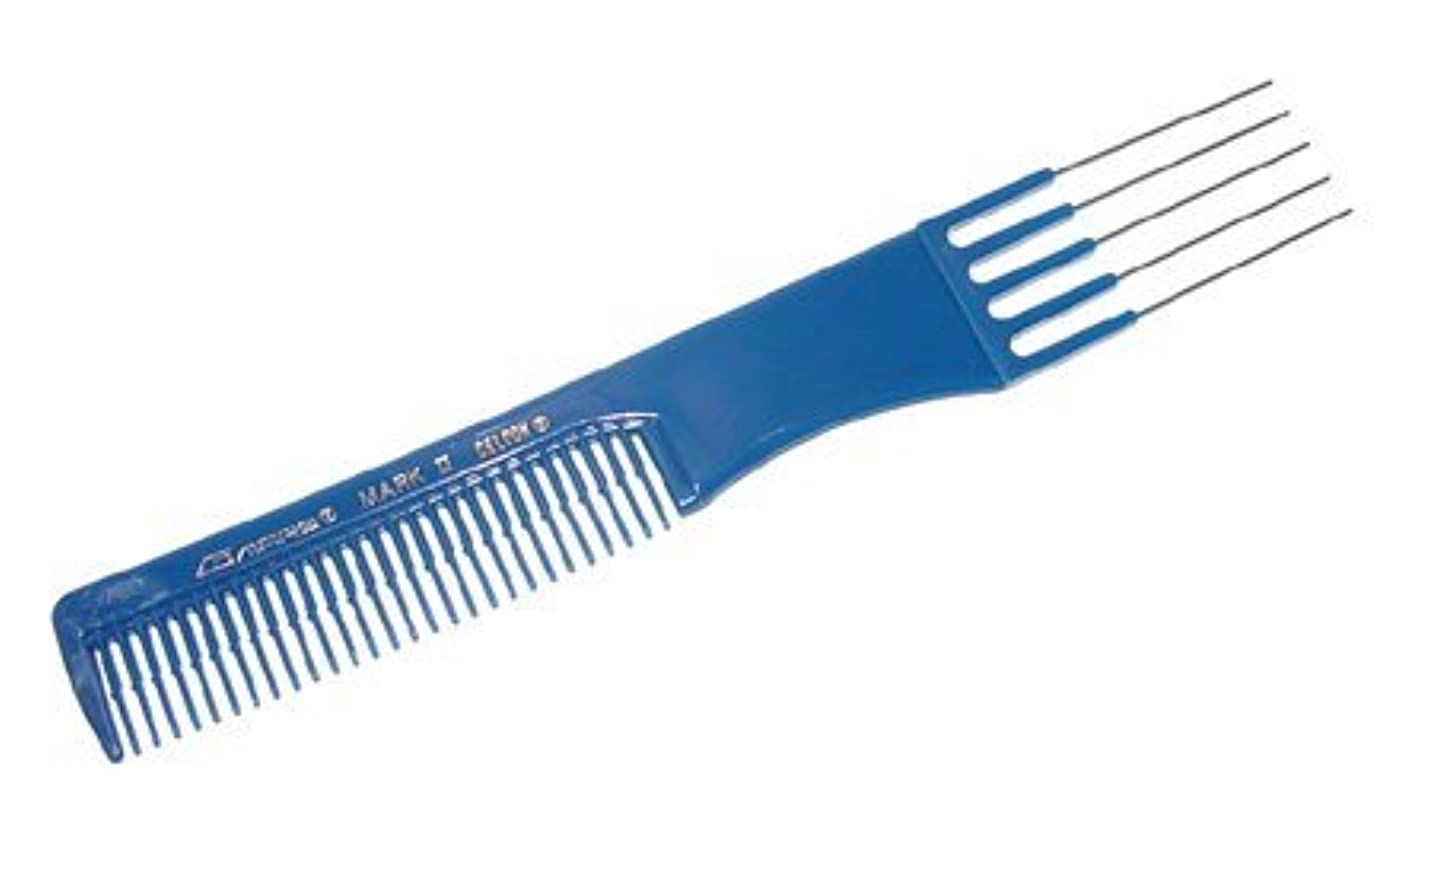 所有権貢献同盟Comare Mark II Stainless Steel Lift Comb [並行輸入品]